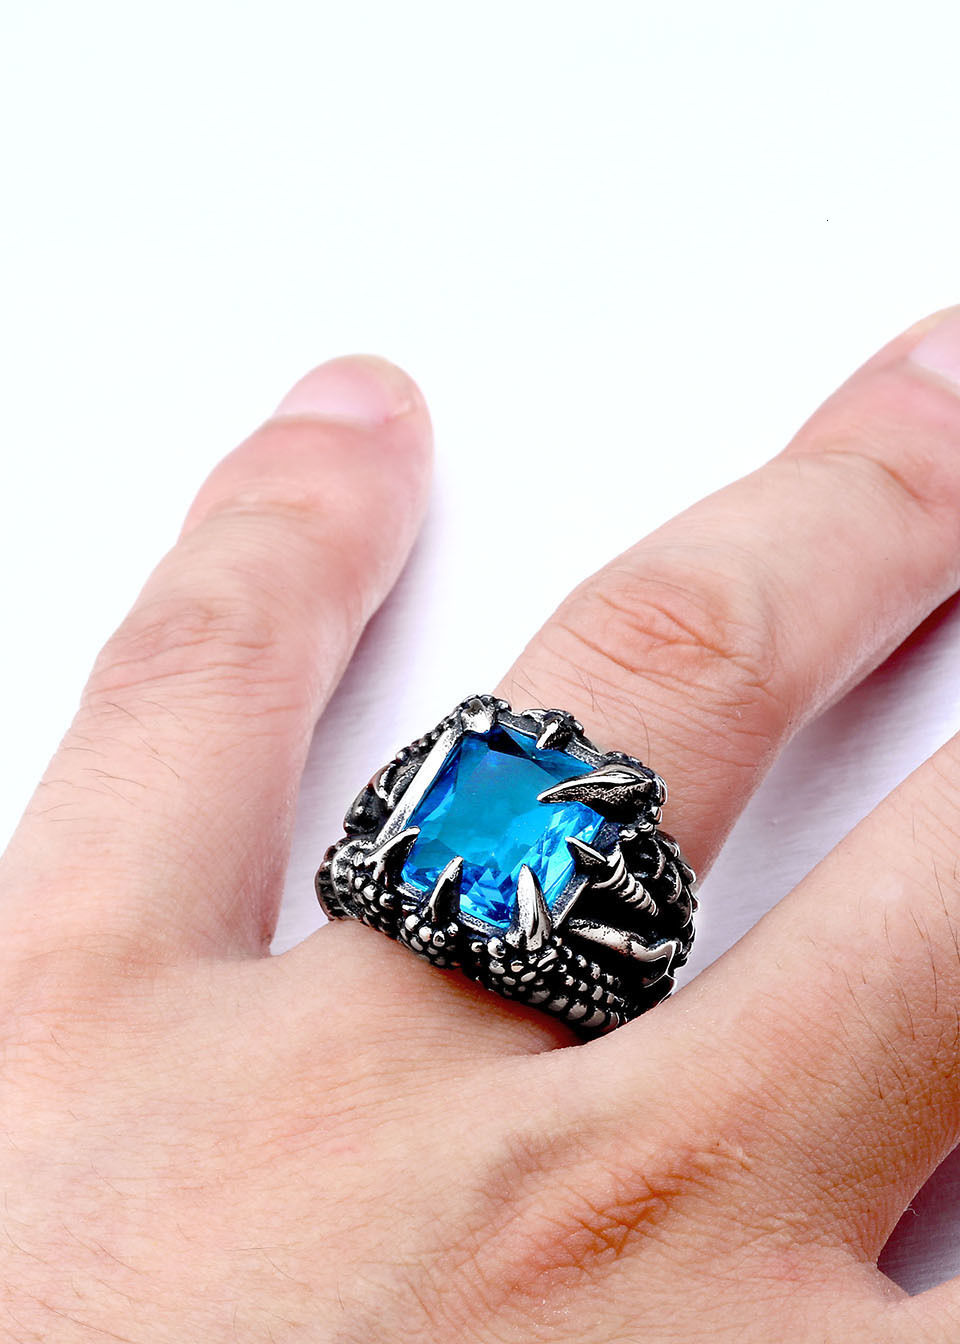 H306cf3fec77149aaa8ba001ded75fab5D - Paladin Dragon Claw Ring